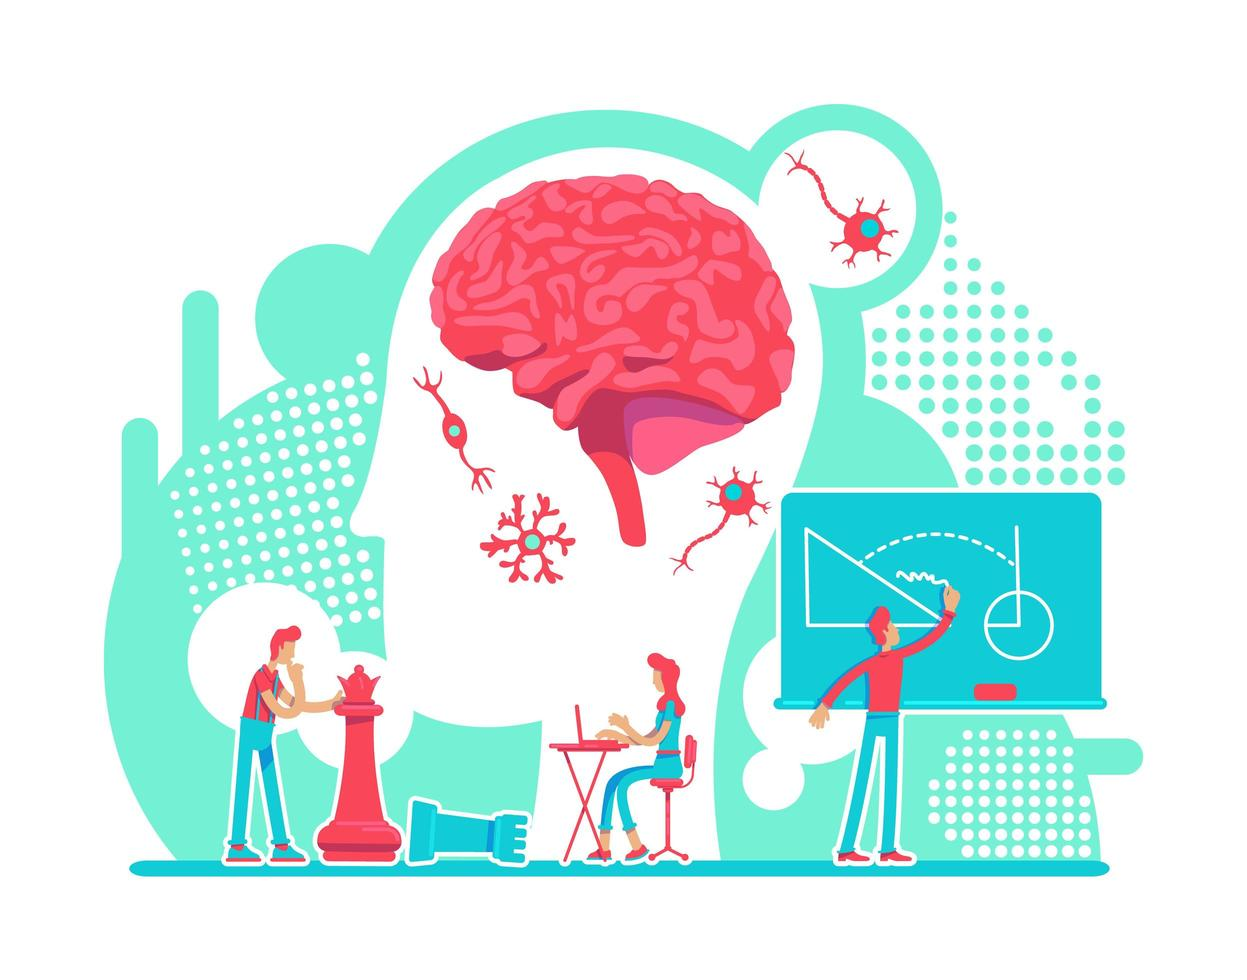 Neurologie-Intelligenzlabor vektor